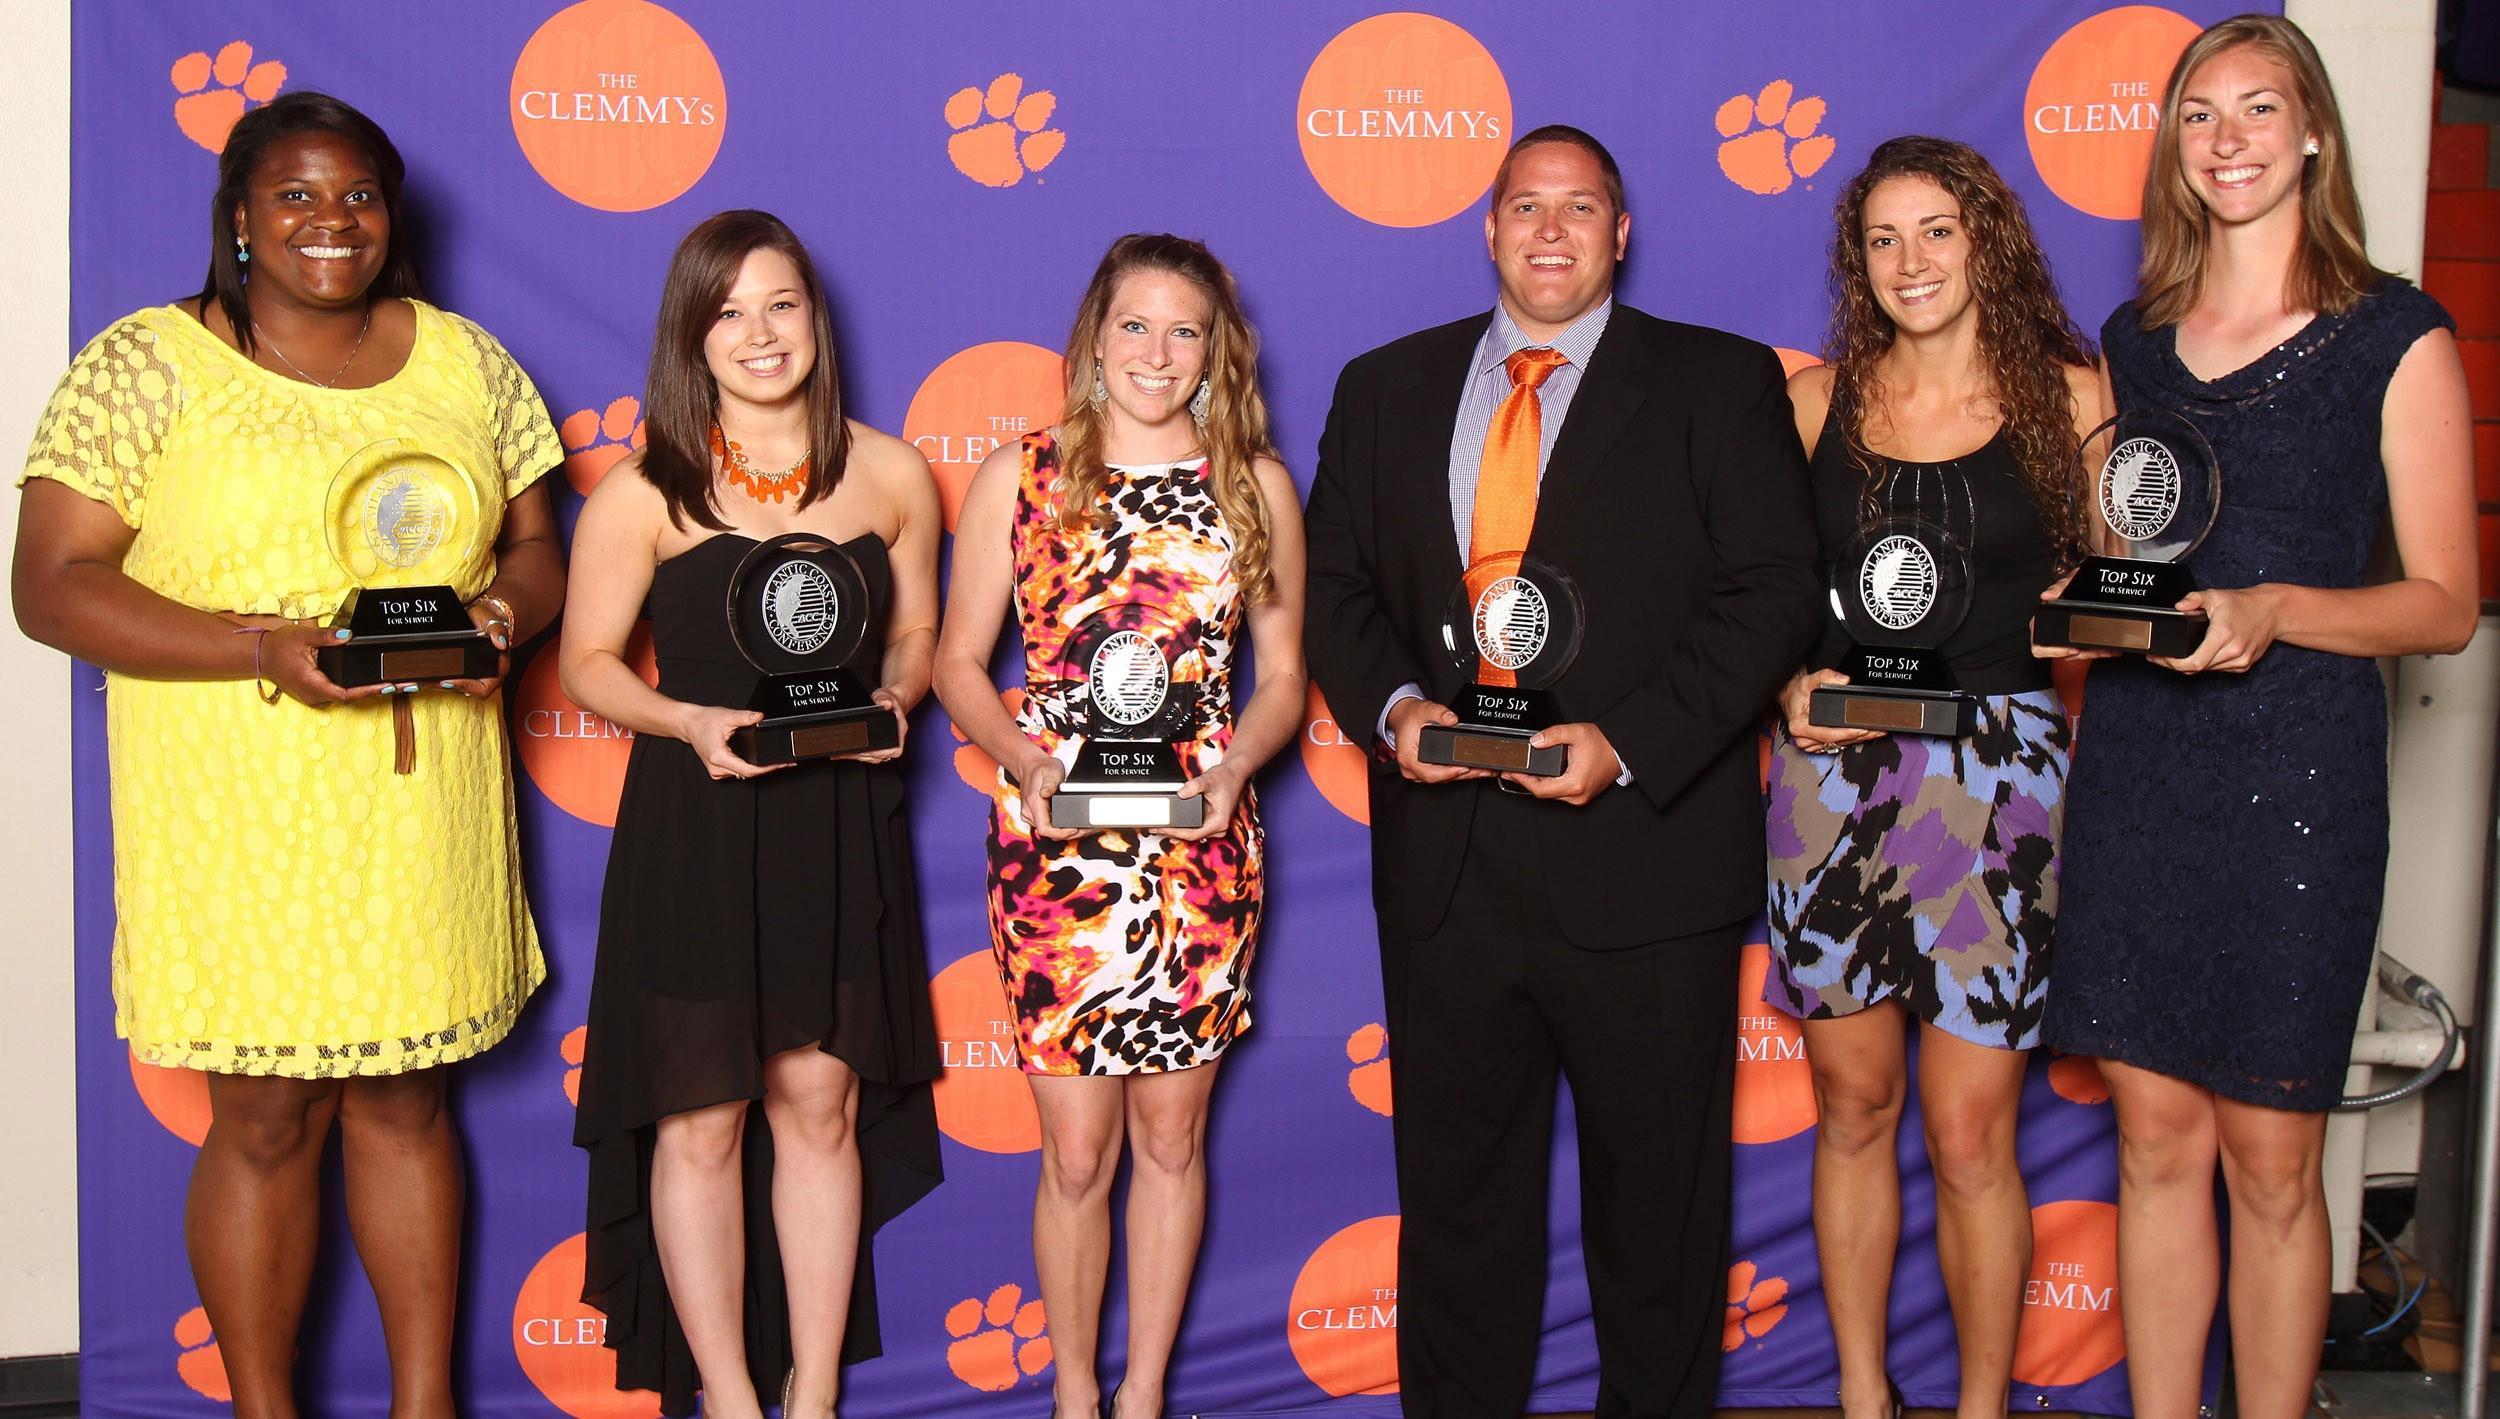 Clemson's 2012-13 ACC Top Six Award for Service Winners